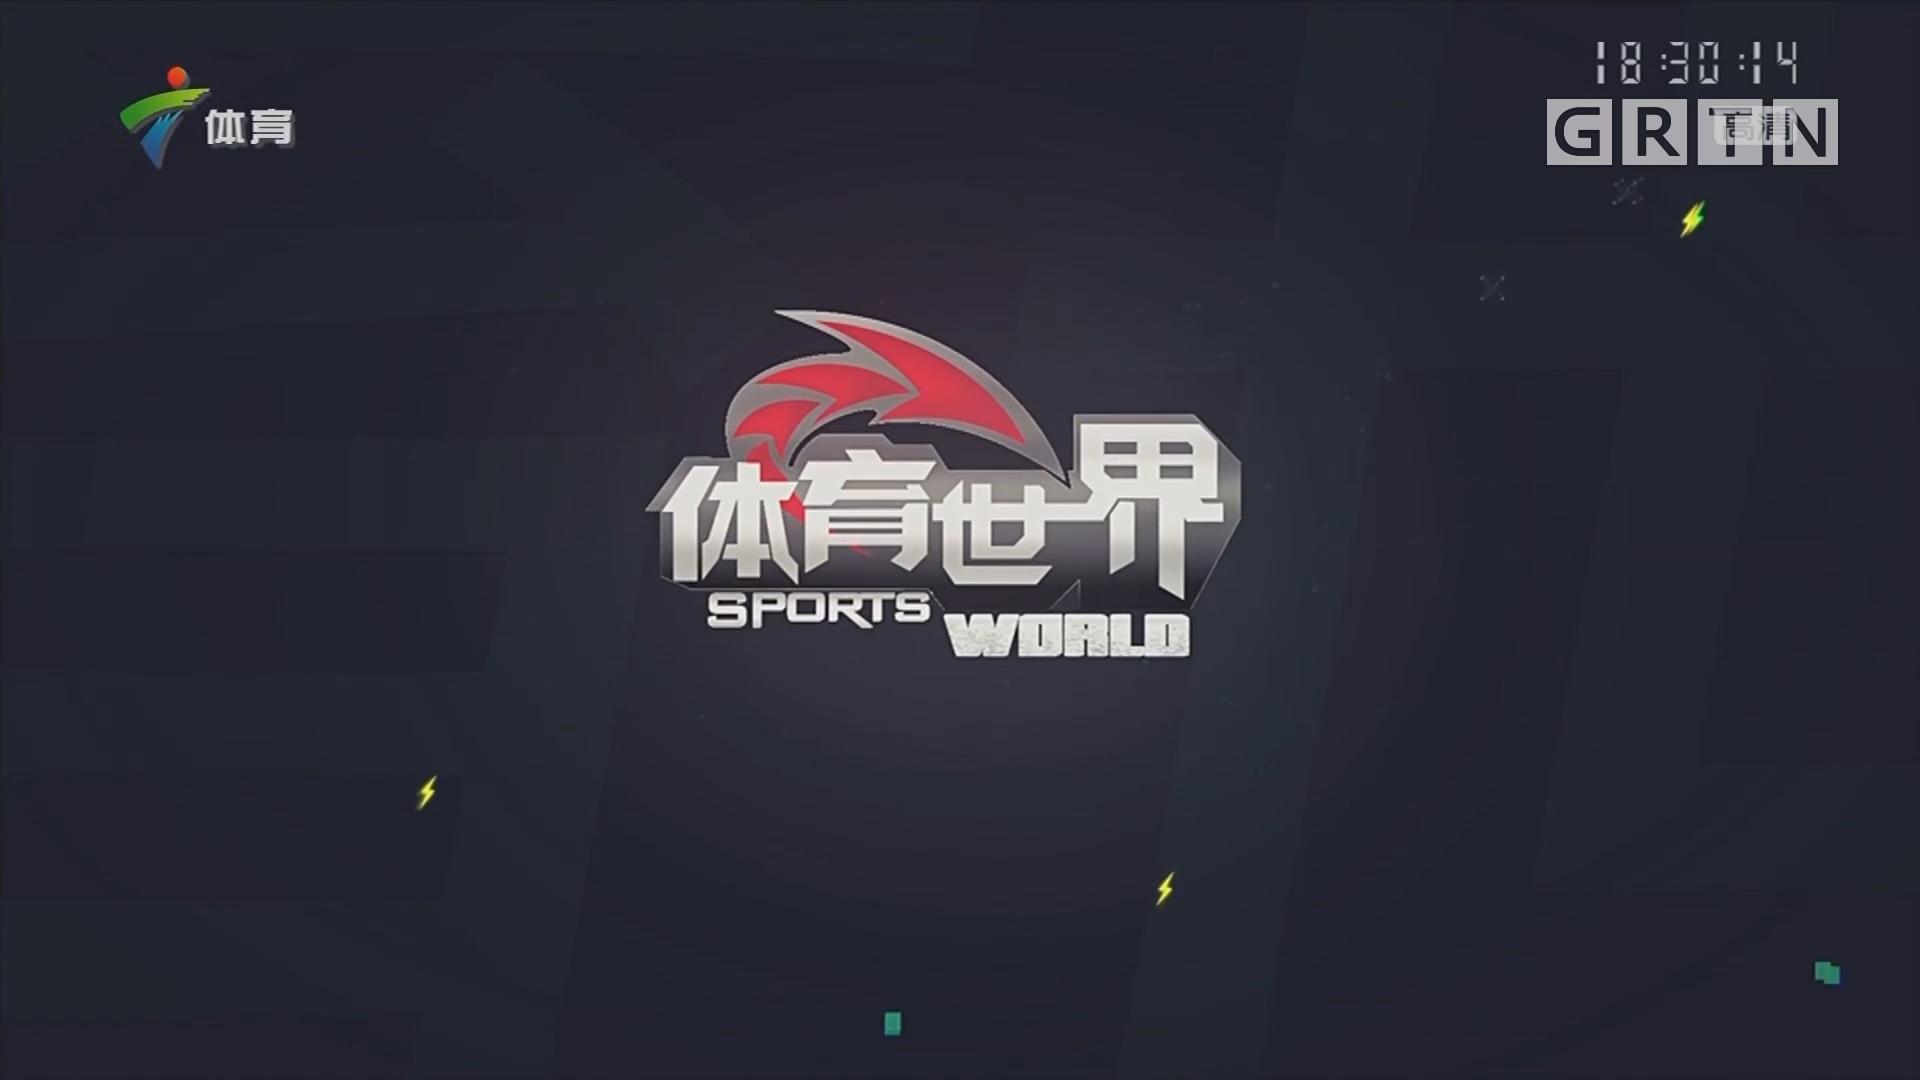 [HD][2019-03-28]体育世界:广州队员陈一鸣夺得首届中国女子围棋名人战冠军